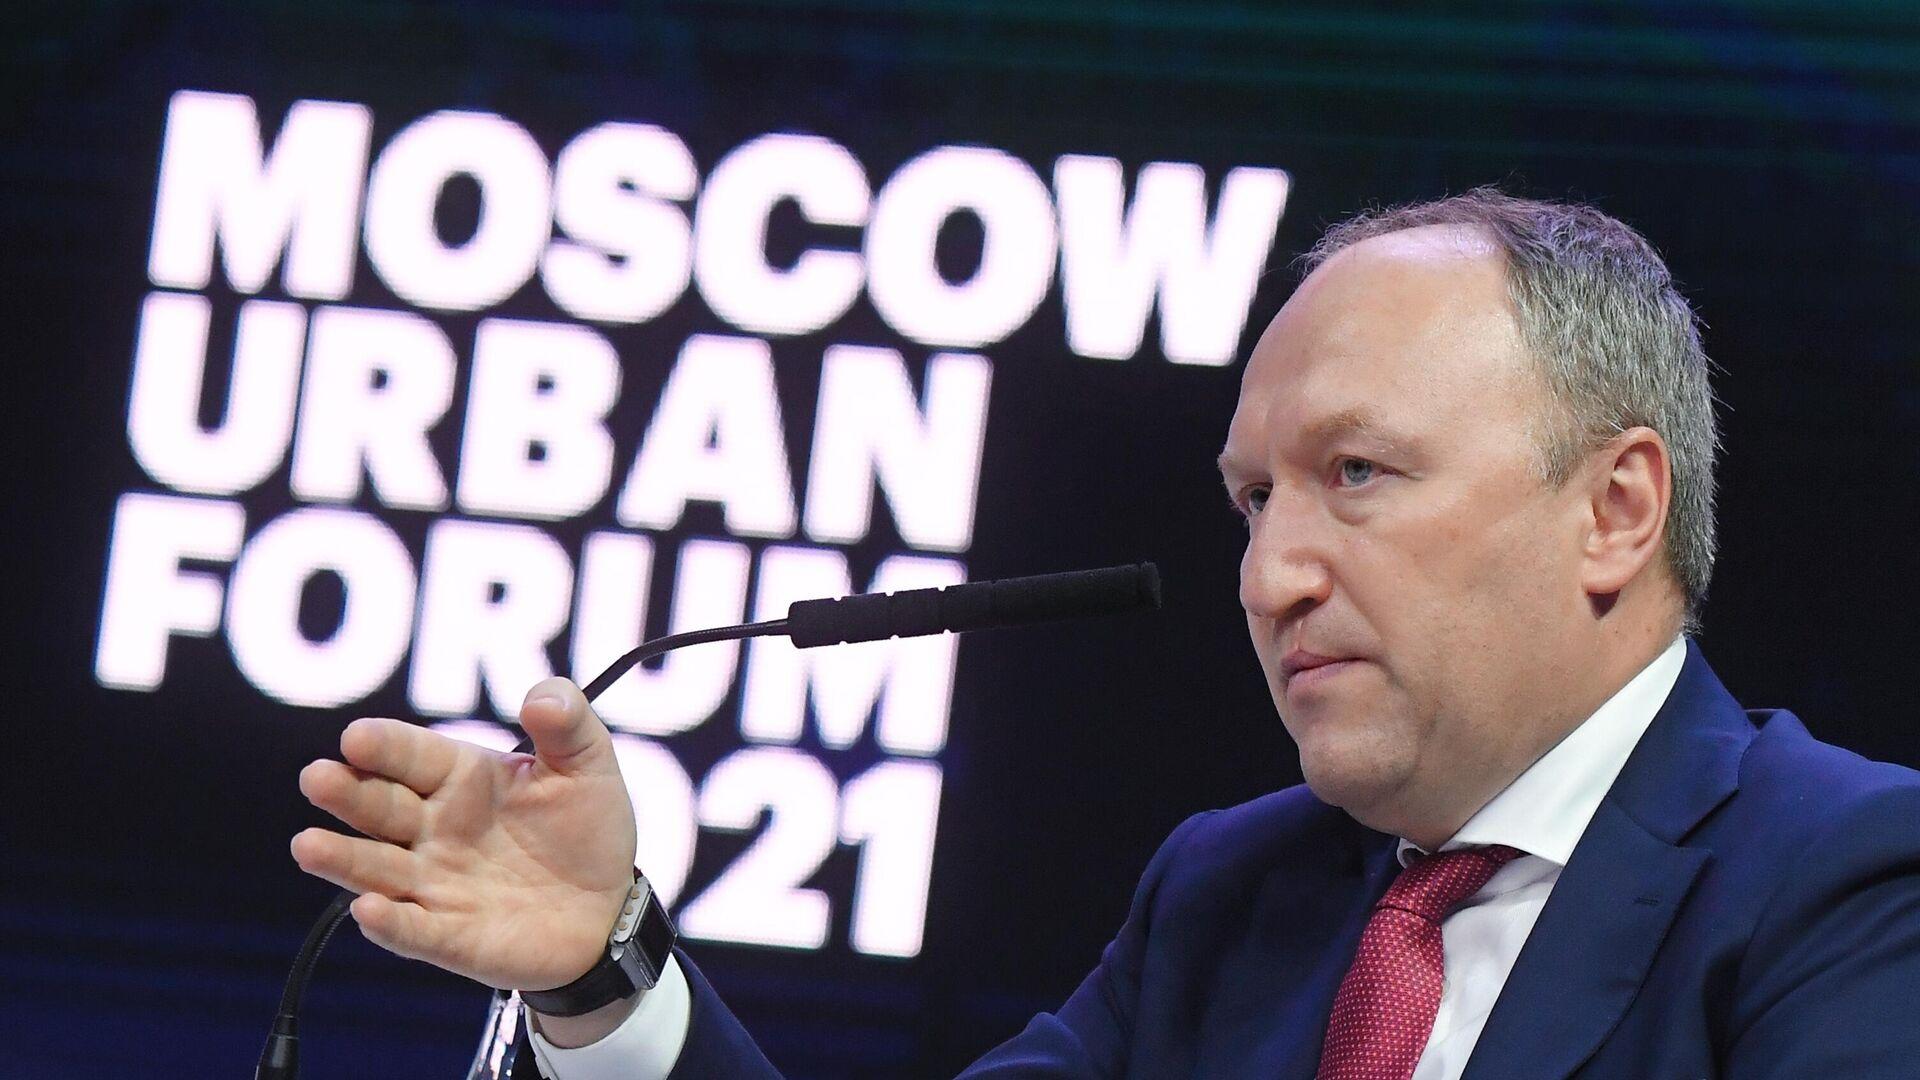 Moscow Urban Forum 2021 - РИА Новости, 1920, 01.07.2021